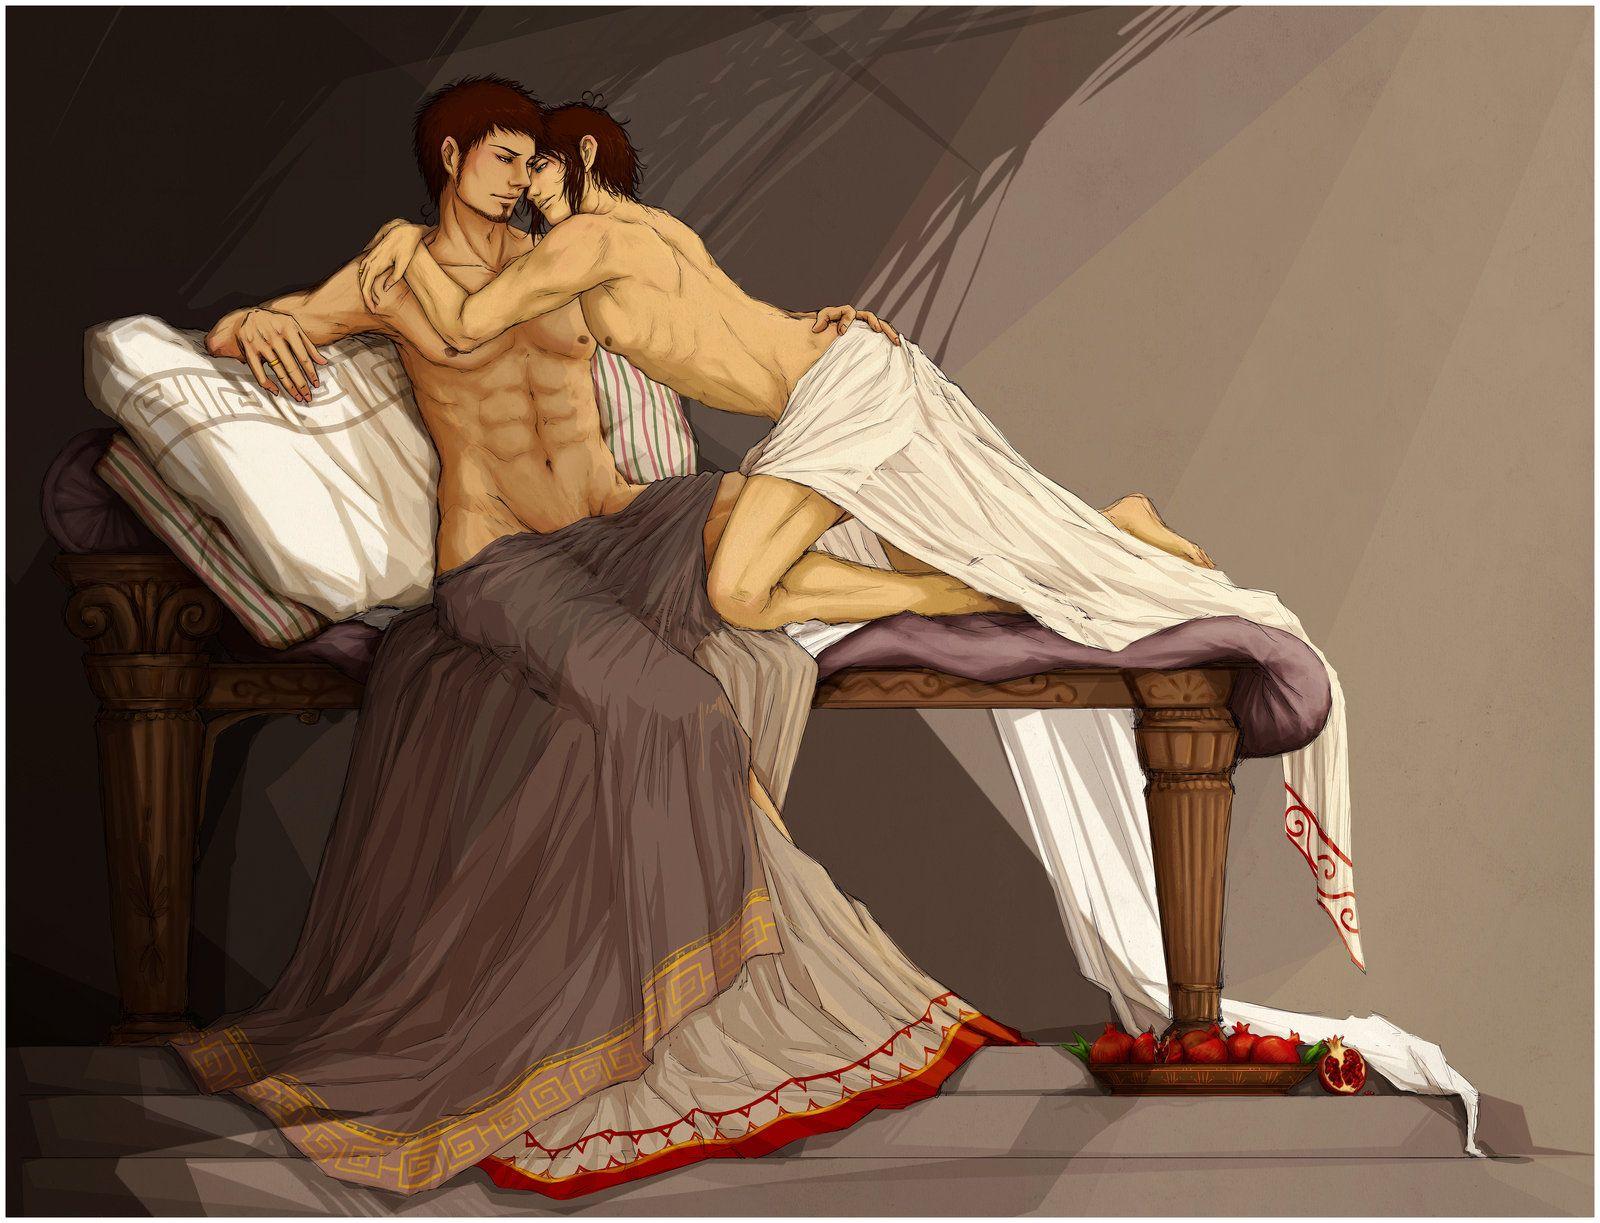 Erotic hades persephone story — img 2